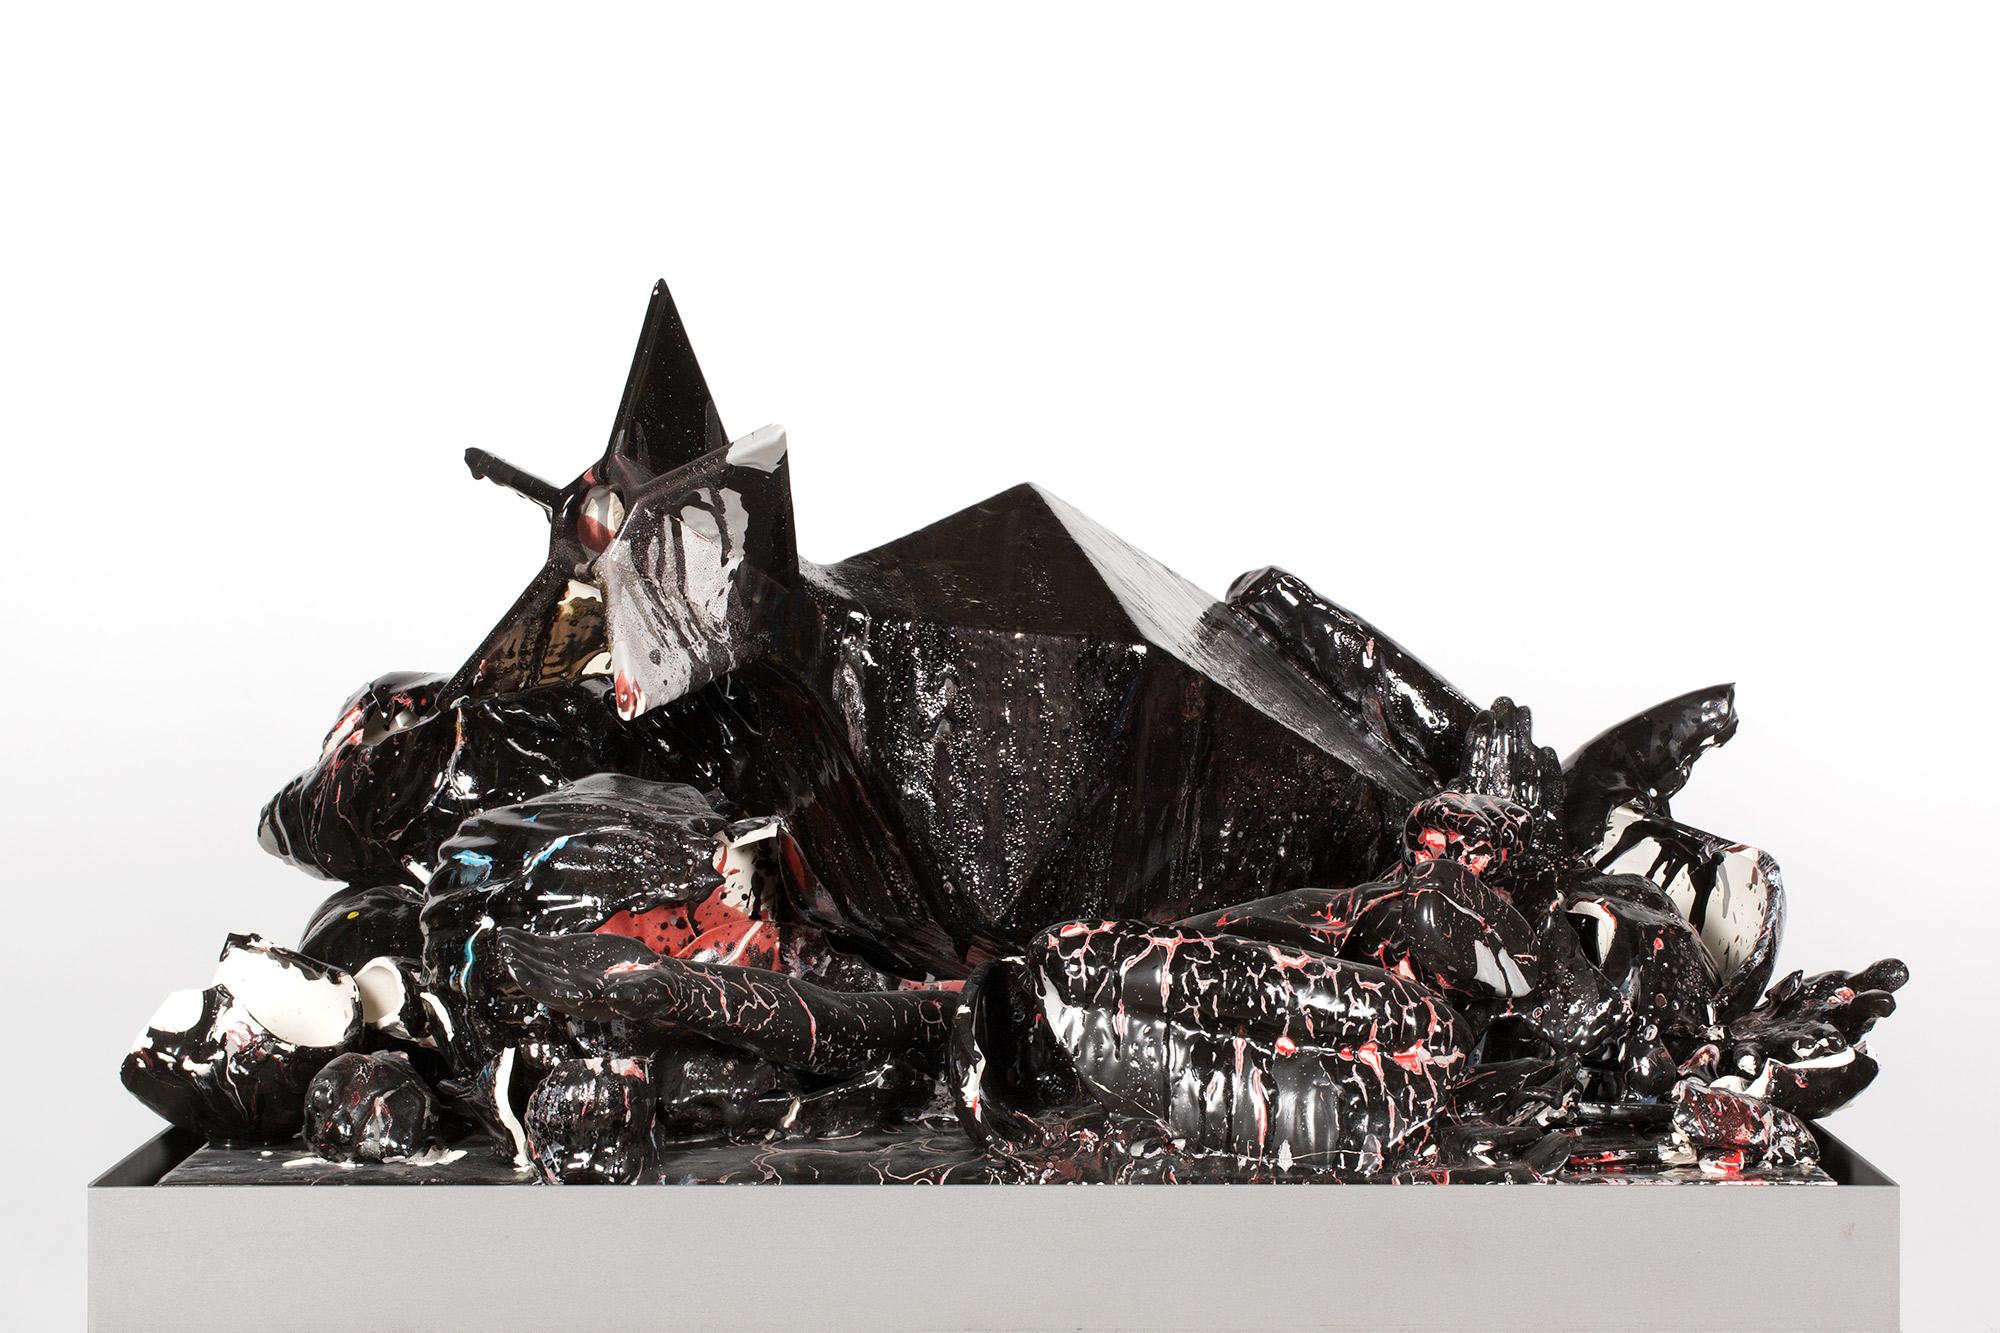 La Religiosidad Americana (February 17–March 1, 2015: Cerámica Suro Contemporánea, Guadalajara, Jalisco, Mexico)   2015  Ceramica Suro slip cast remnants, glaze, and firing plate  55 1/2 x 42 x 26 1/2 inches   Ceramics, 2013–    All the World's Futures, 2015